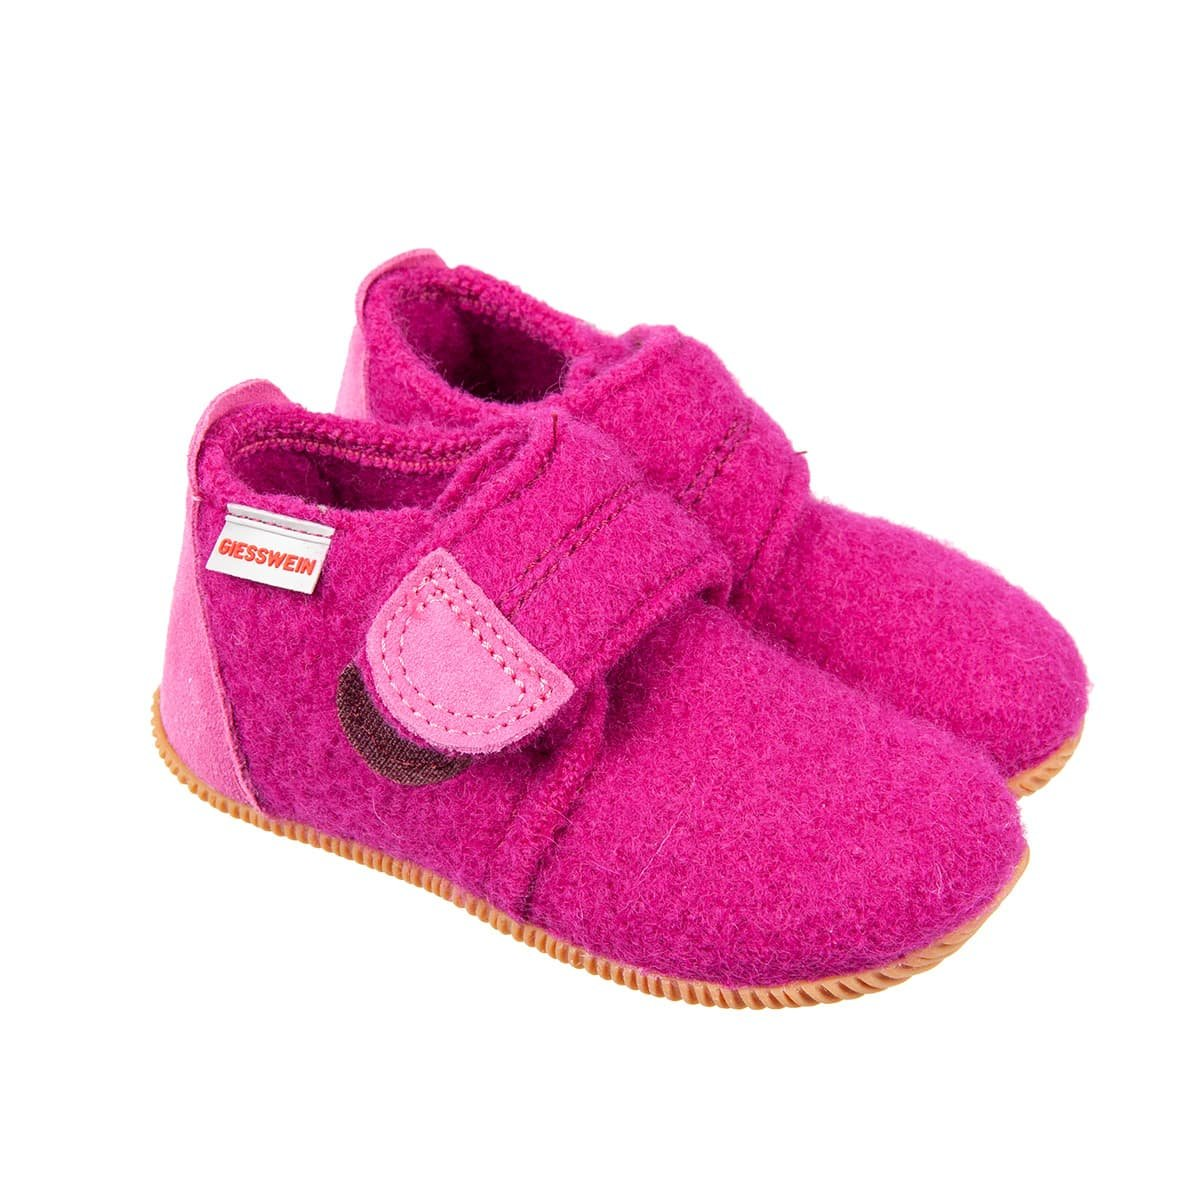 slippers Oberstaufen style signed Giesswein